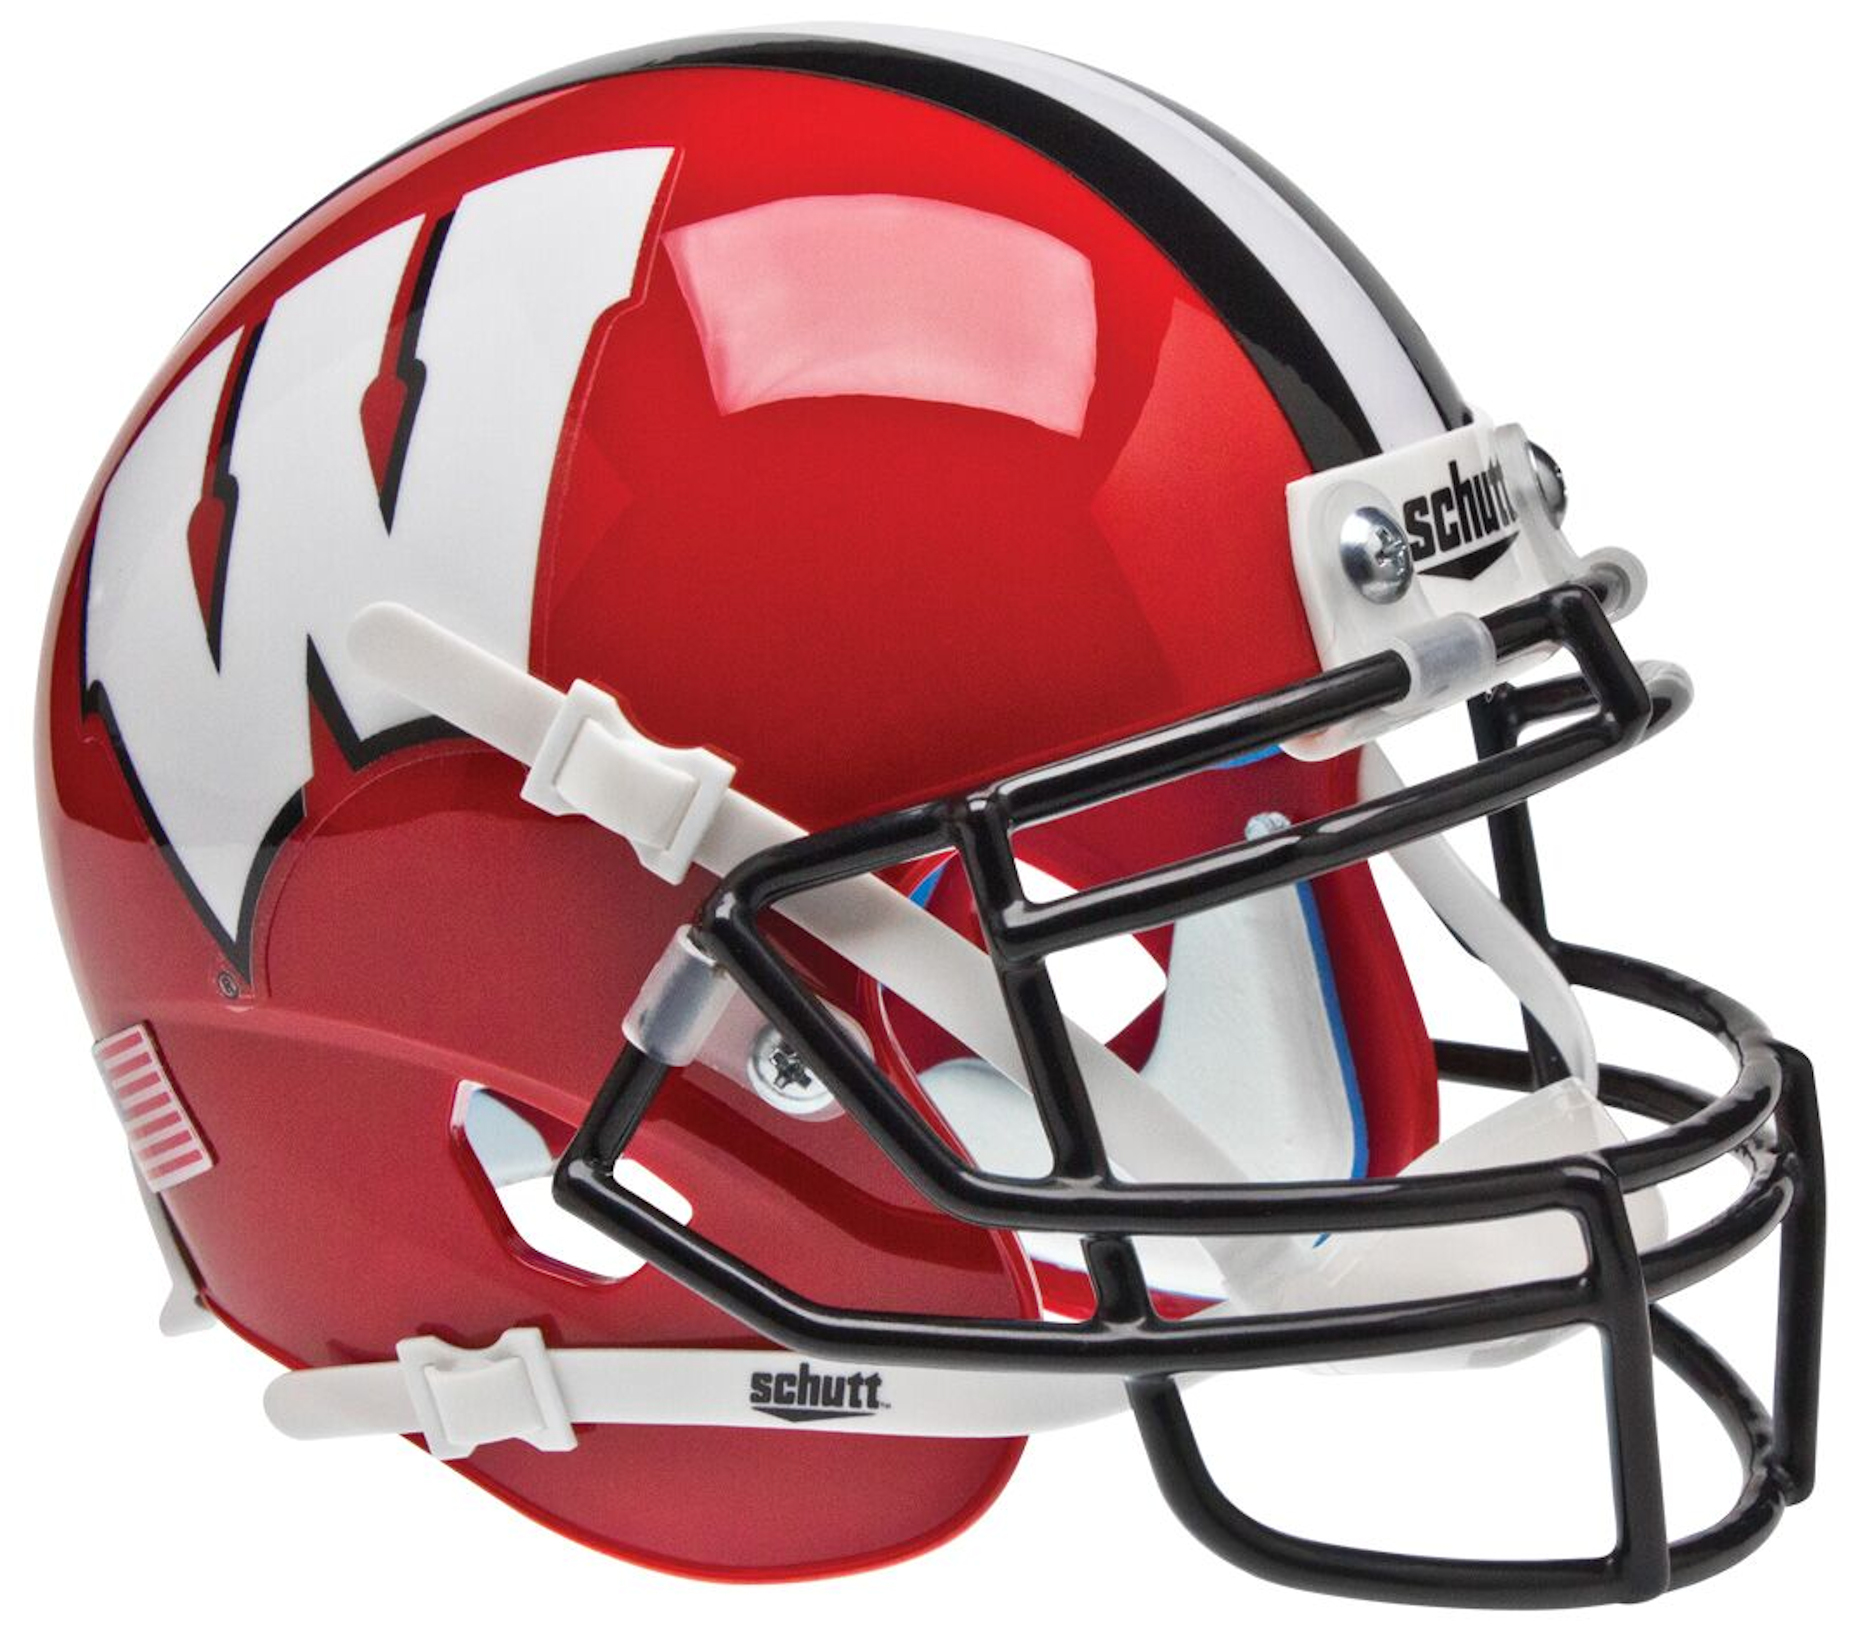 Wisconsin Badgers Mini XP Authentic Helmet Schutt <B>Red Black Mask</B>